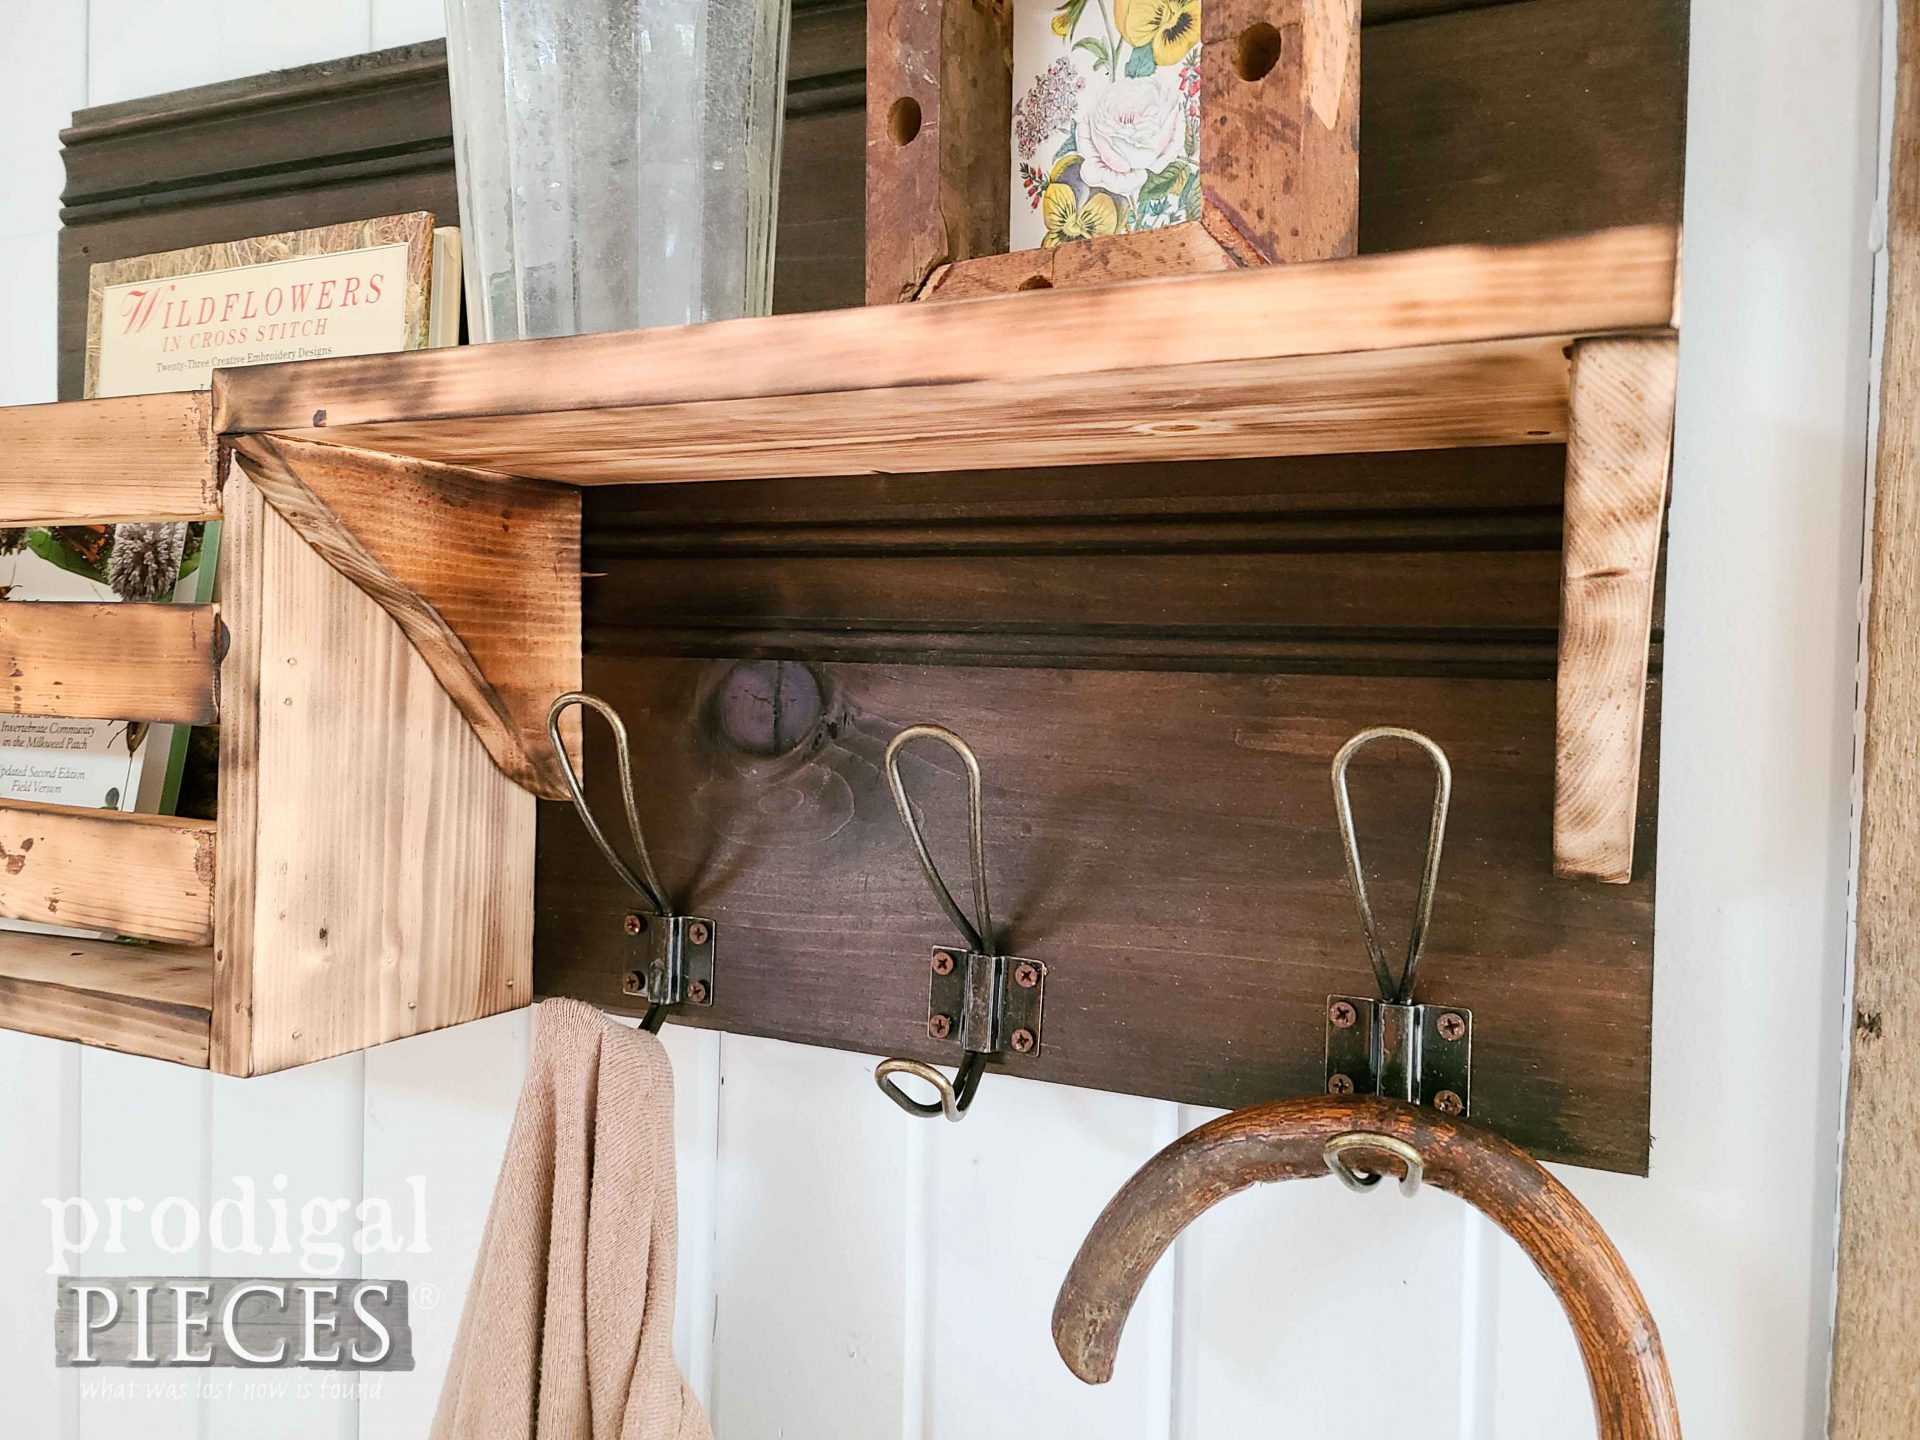 Wire Coat Hooks on DIY Scorched Wood Shelf Tutorial by Larissa of Prodigal Pieces | prodigalpieces.com #prodigalpieces #rustic #farmhouse #storage